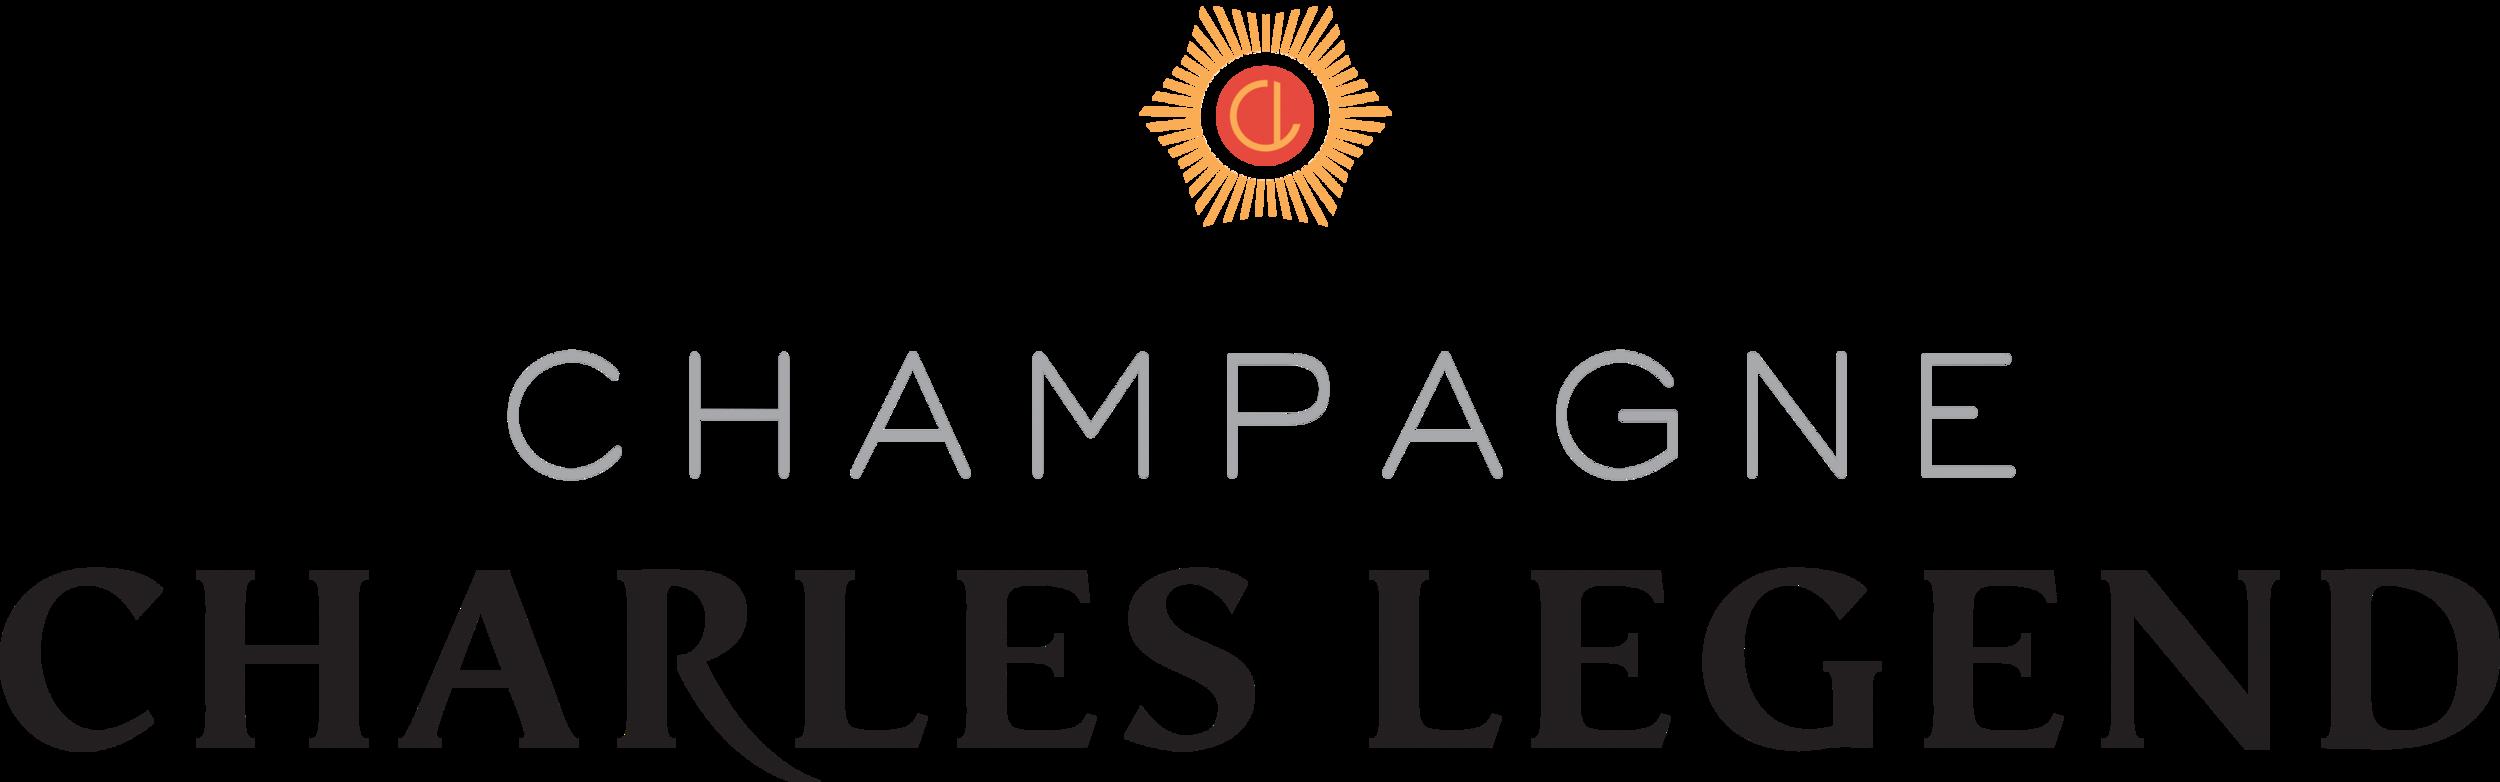 Charles Legend Logo white.png